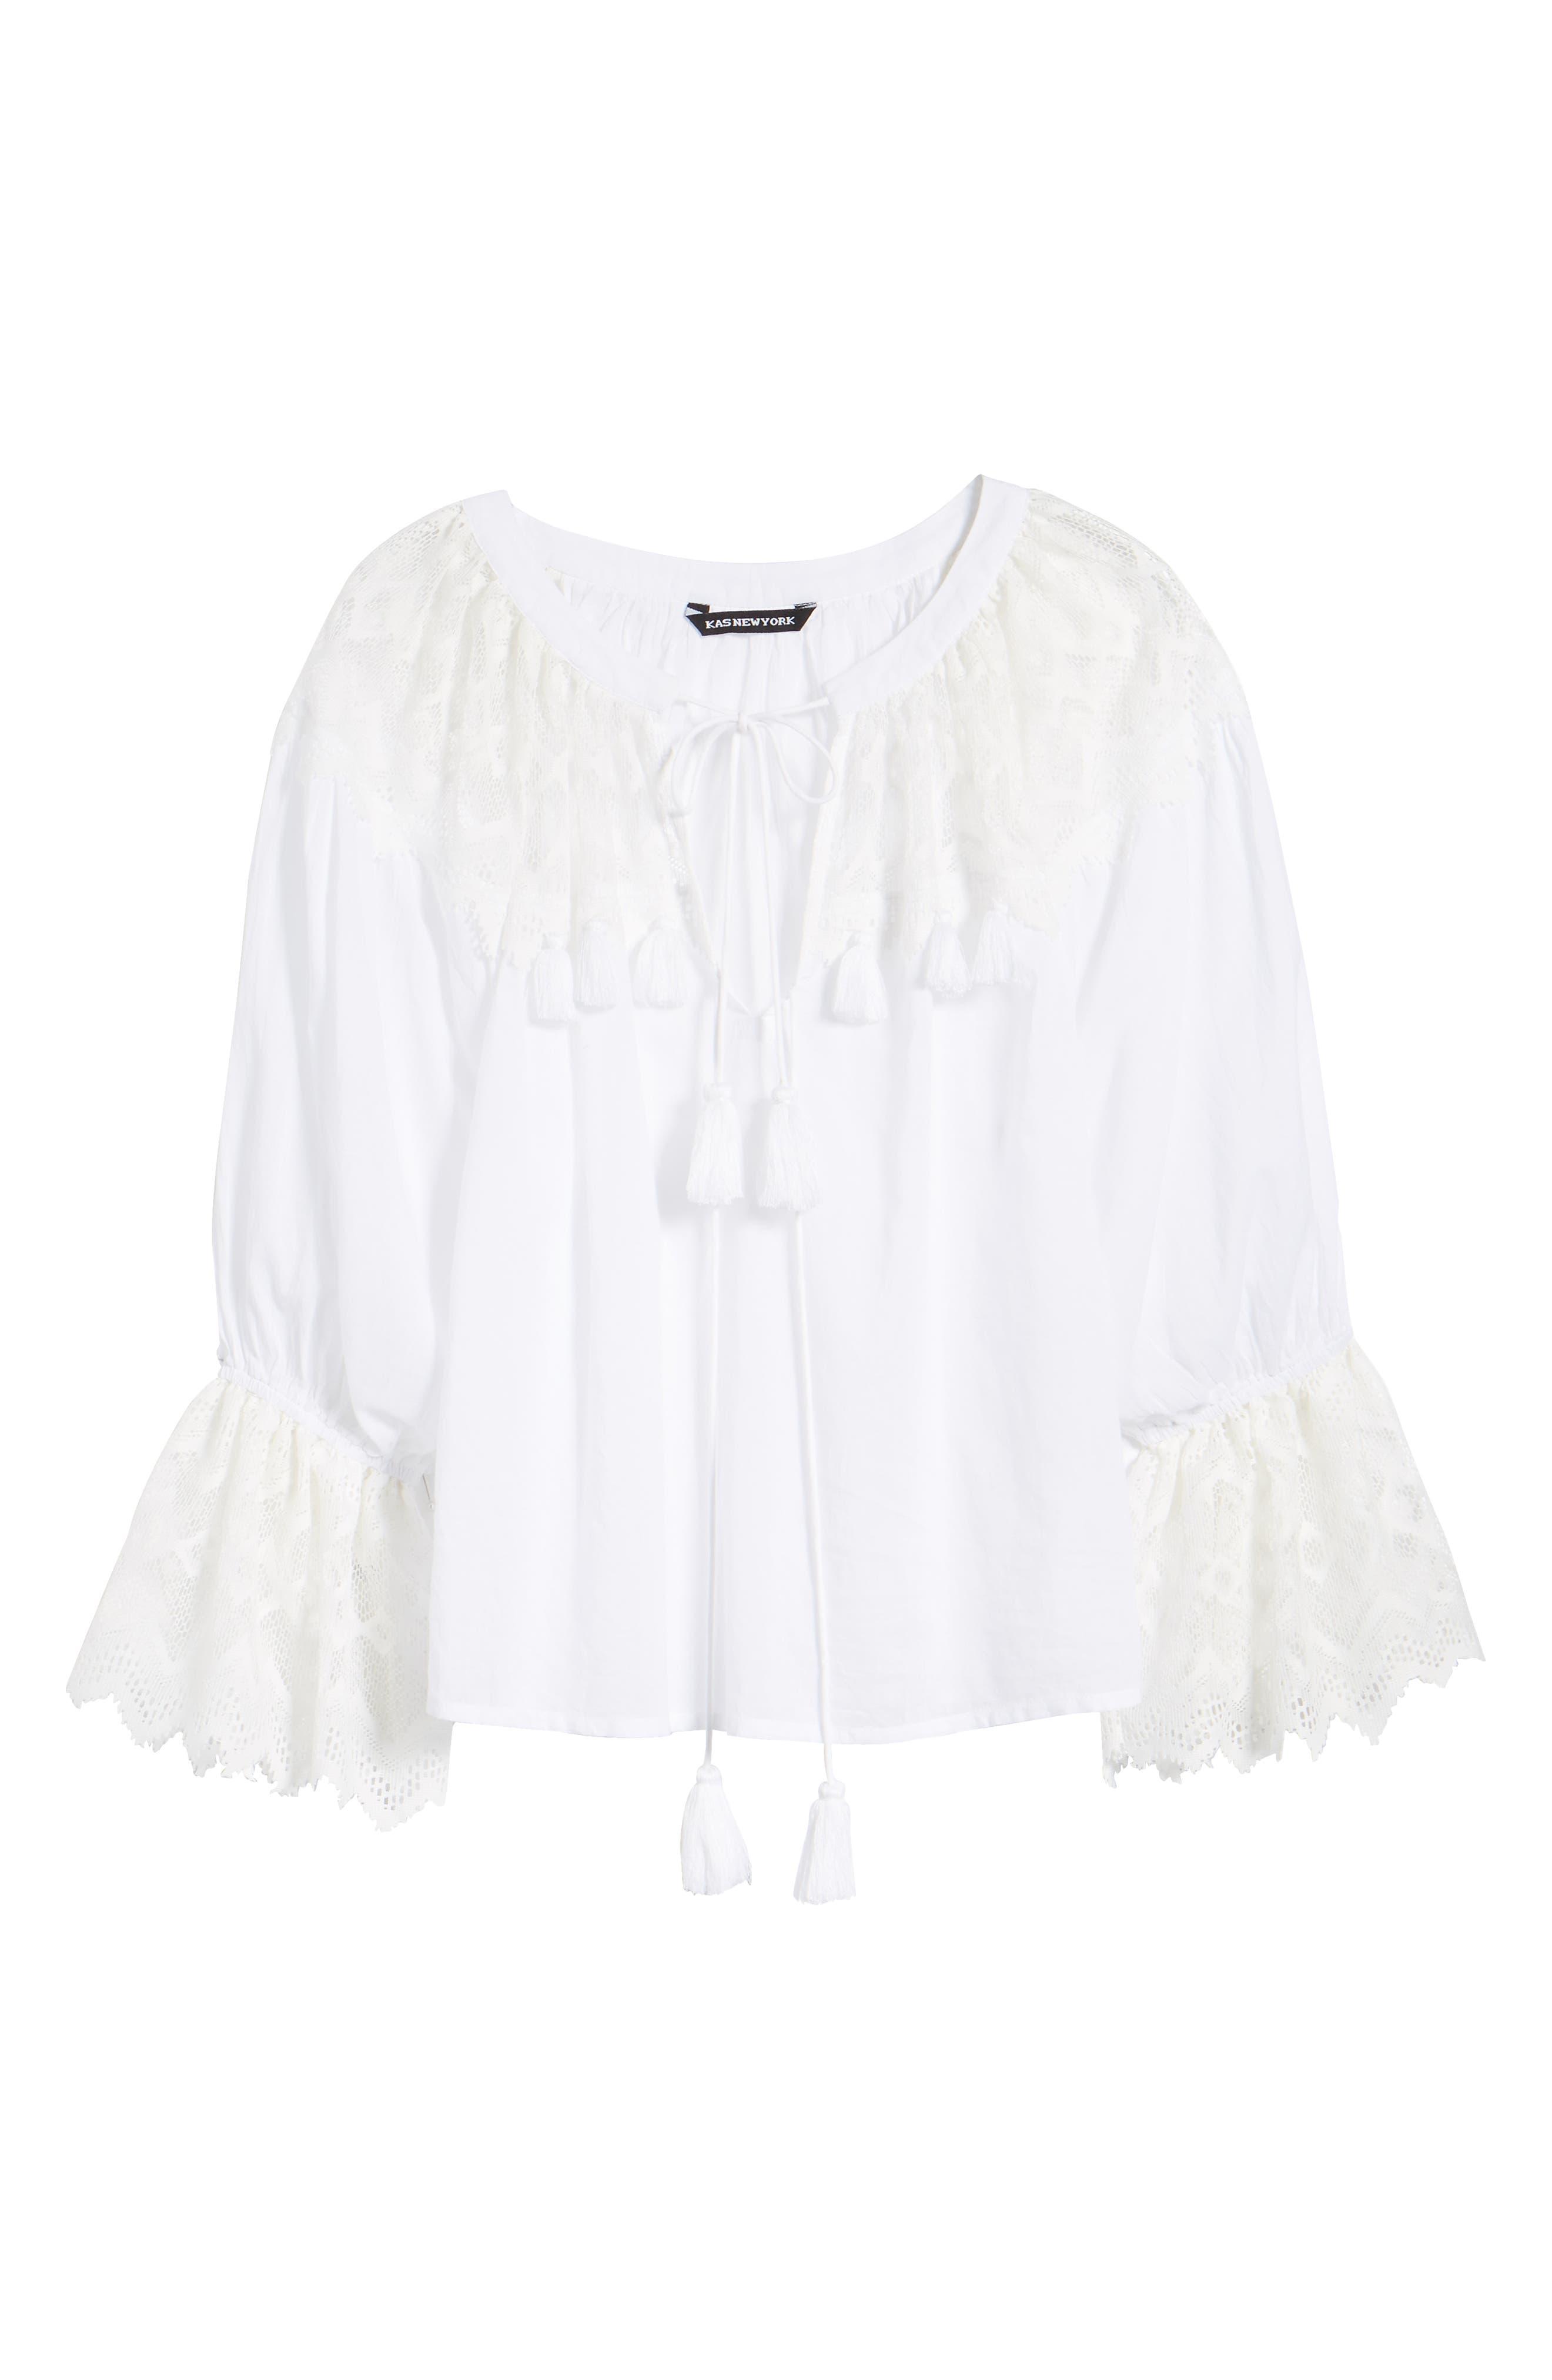 Berkley White Lace Cotton Blend Top,                             Alternate thumbnail 7, color,                             WHITE